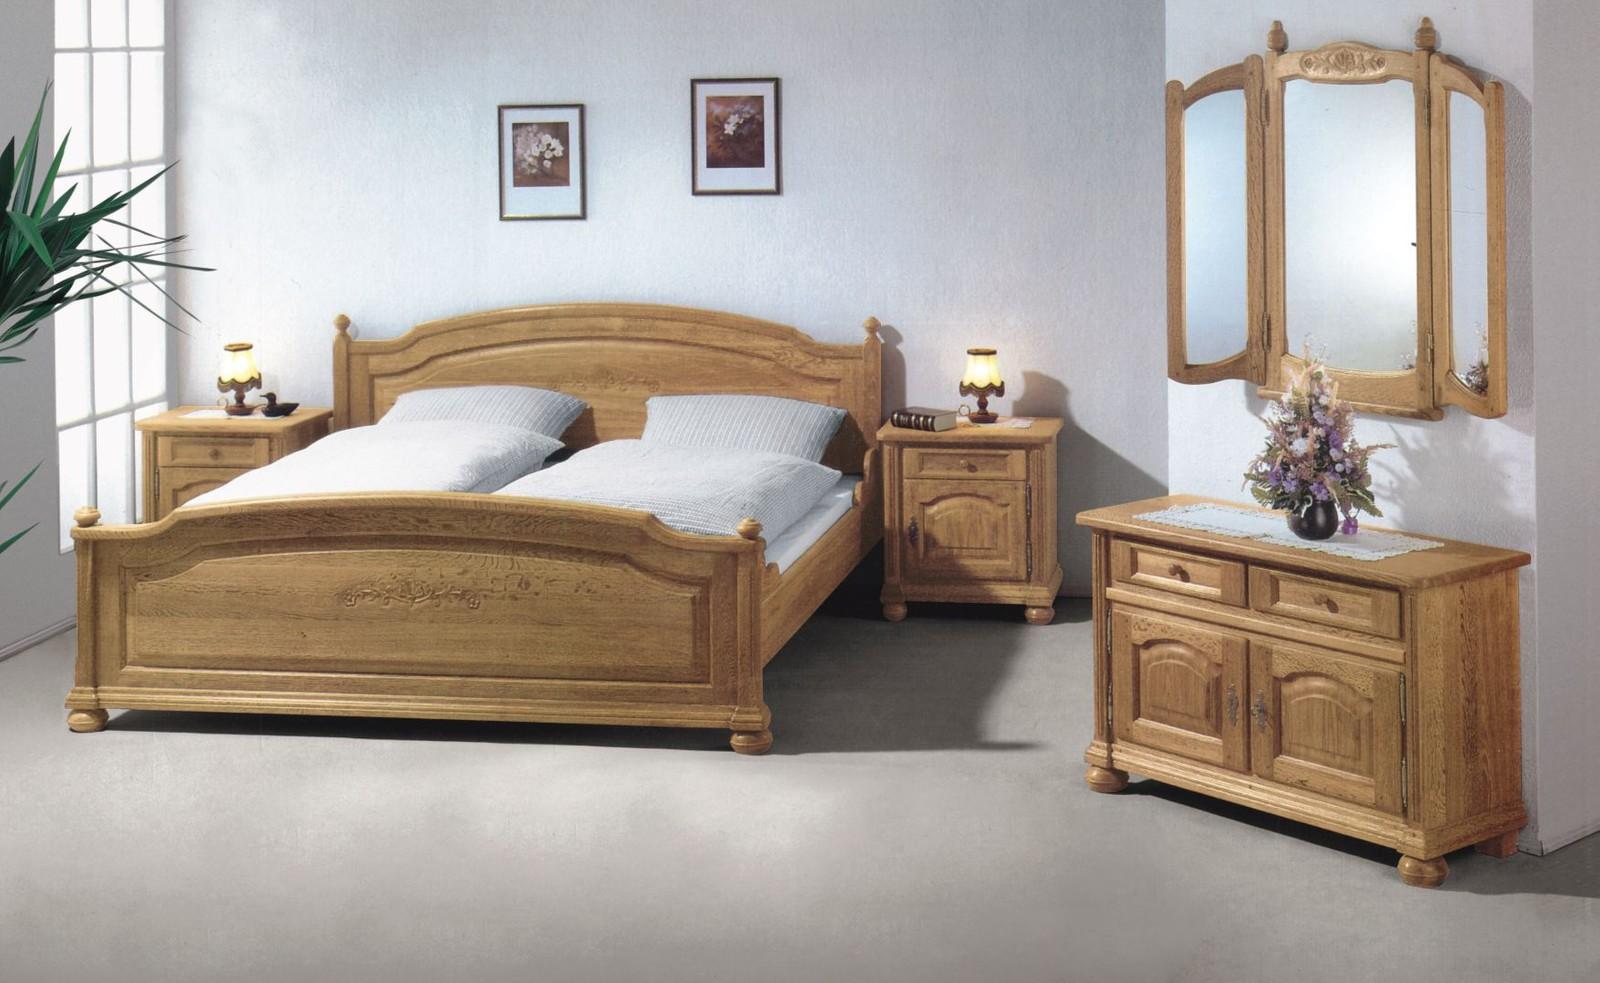 Full Size of Rustikales Bett Bettgestell Rustikale Holzbetten Betten Kaufen Selber Bauen Rustikal Massivholzbetten 140x200 Schlafzimmerprogramm Weissensee 160x200 Box Bett Rustikales Bett